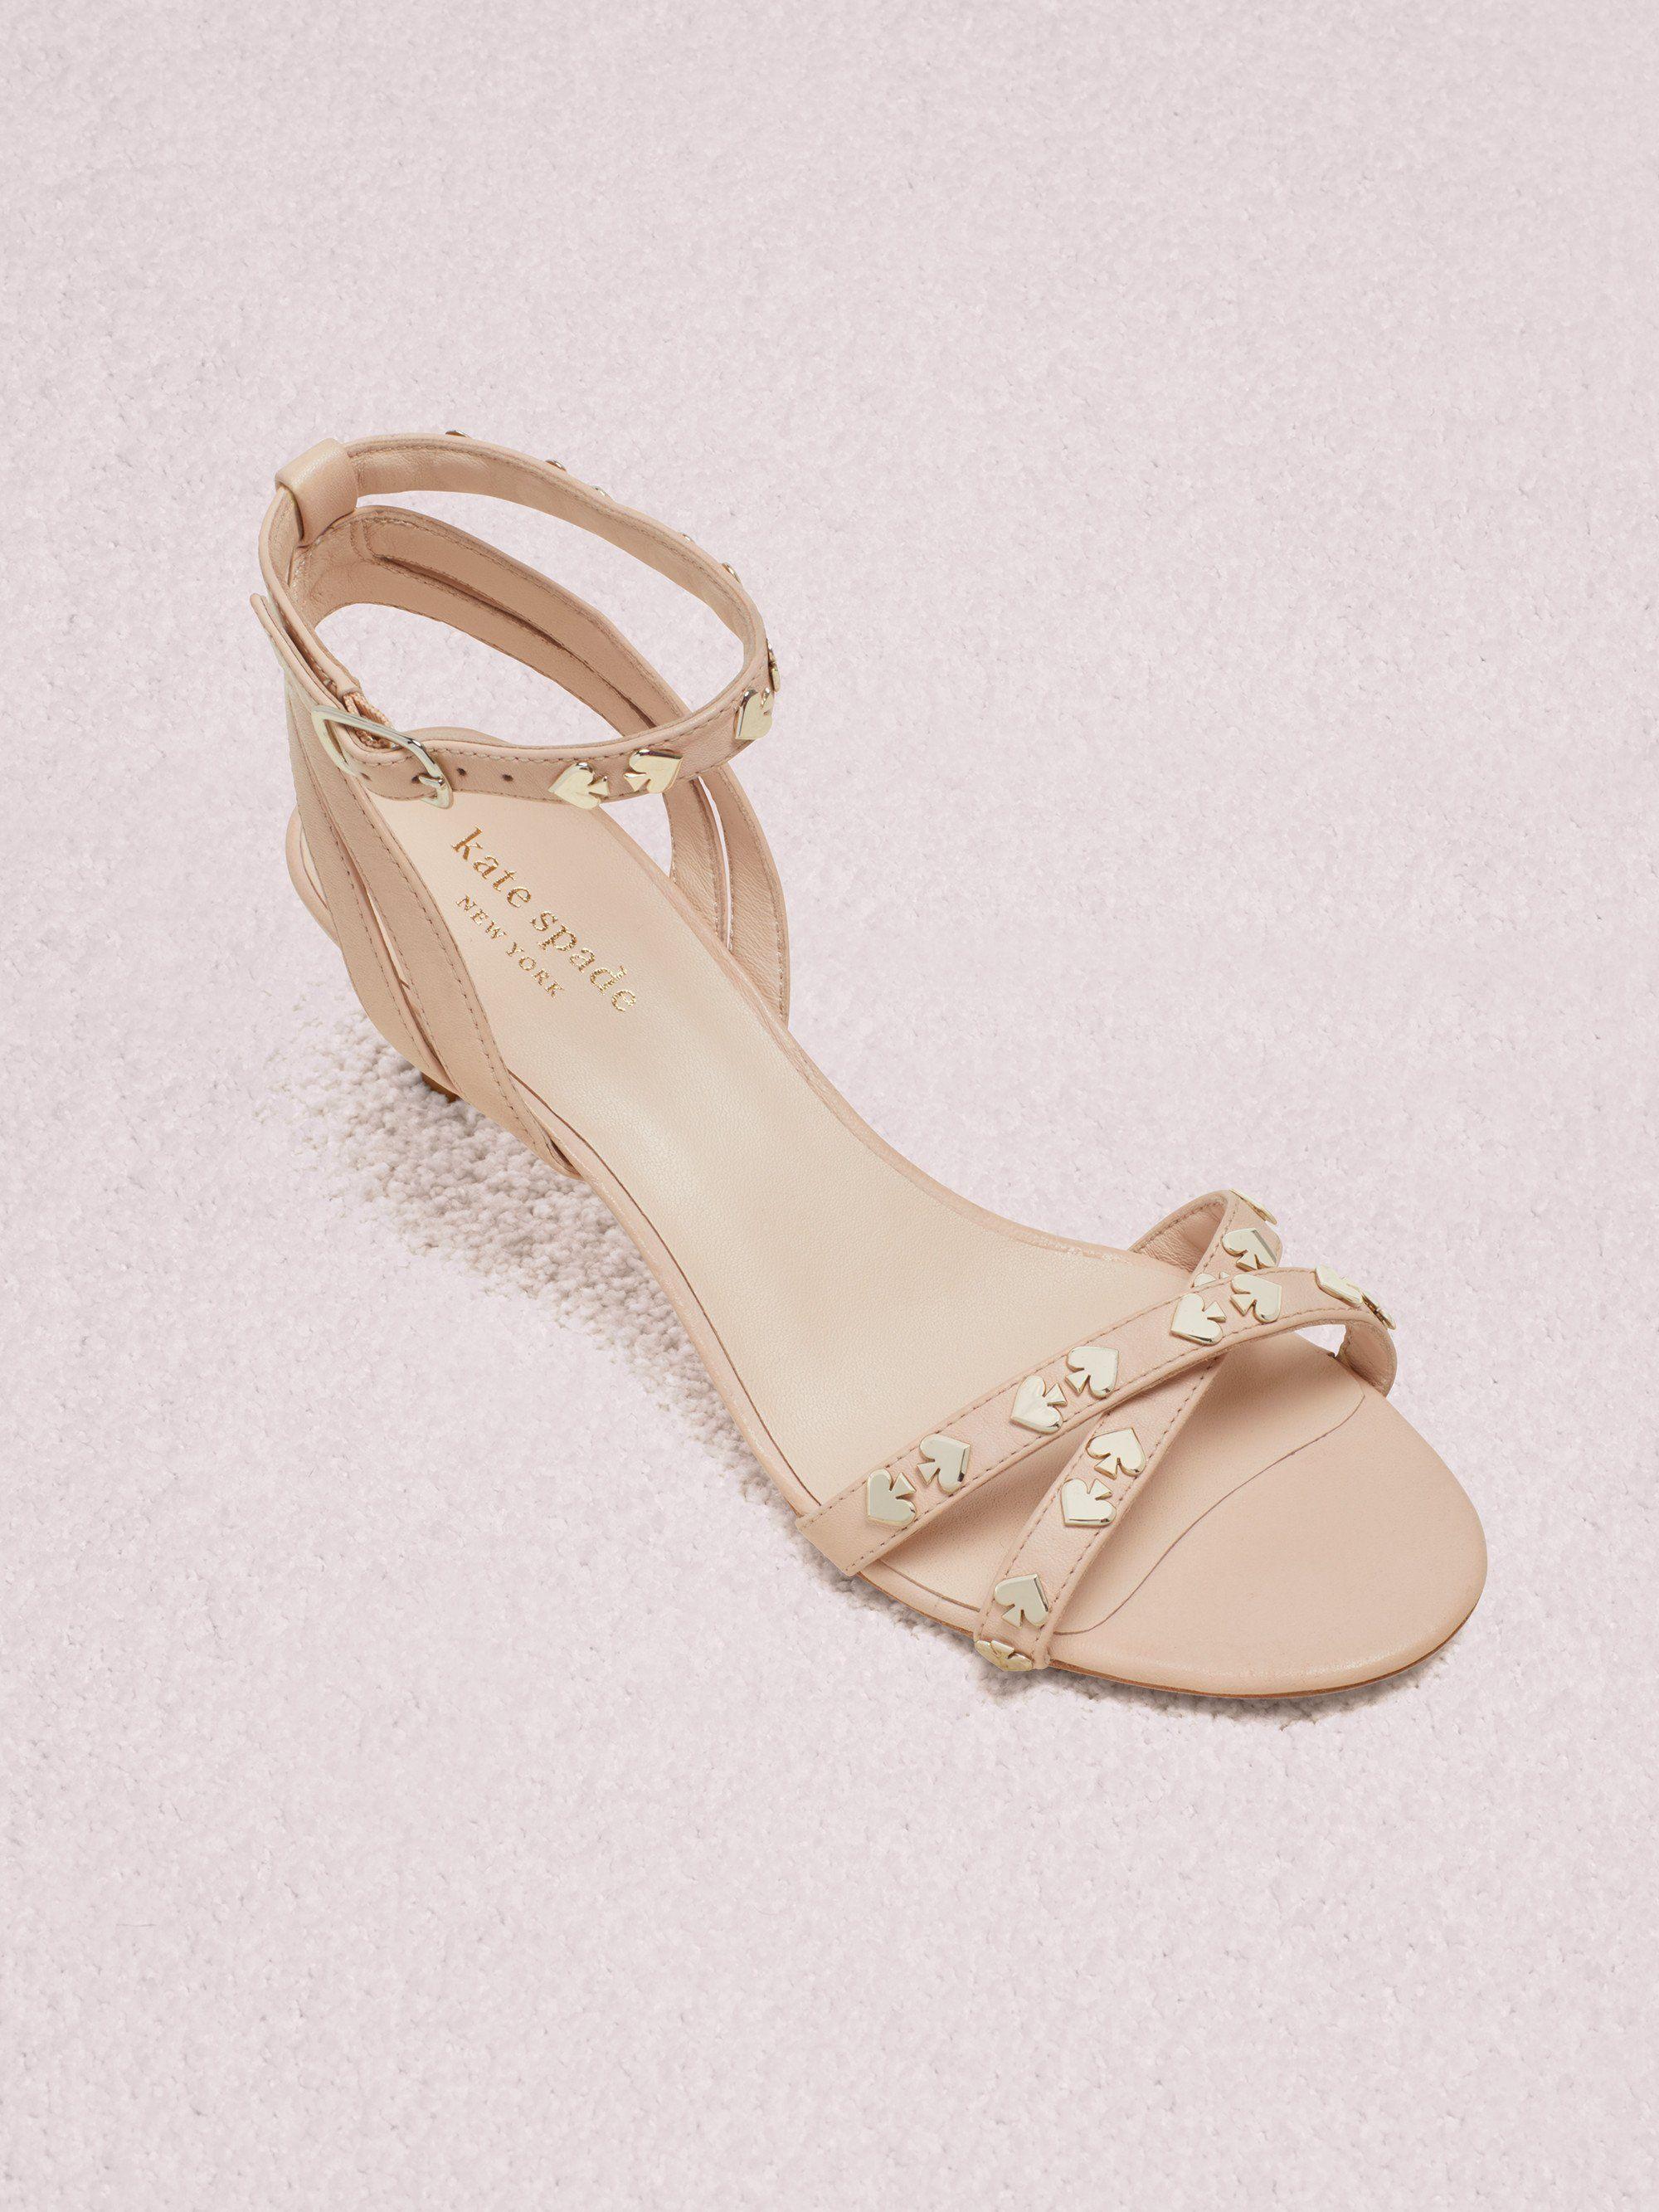 Selma Sandals Sandals Kate Spade Women Shoes